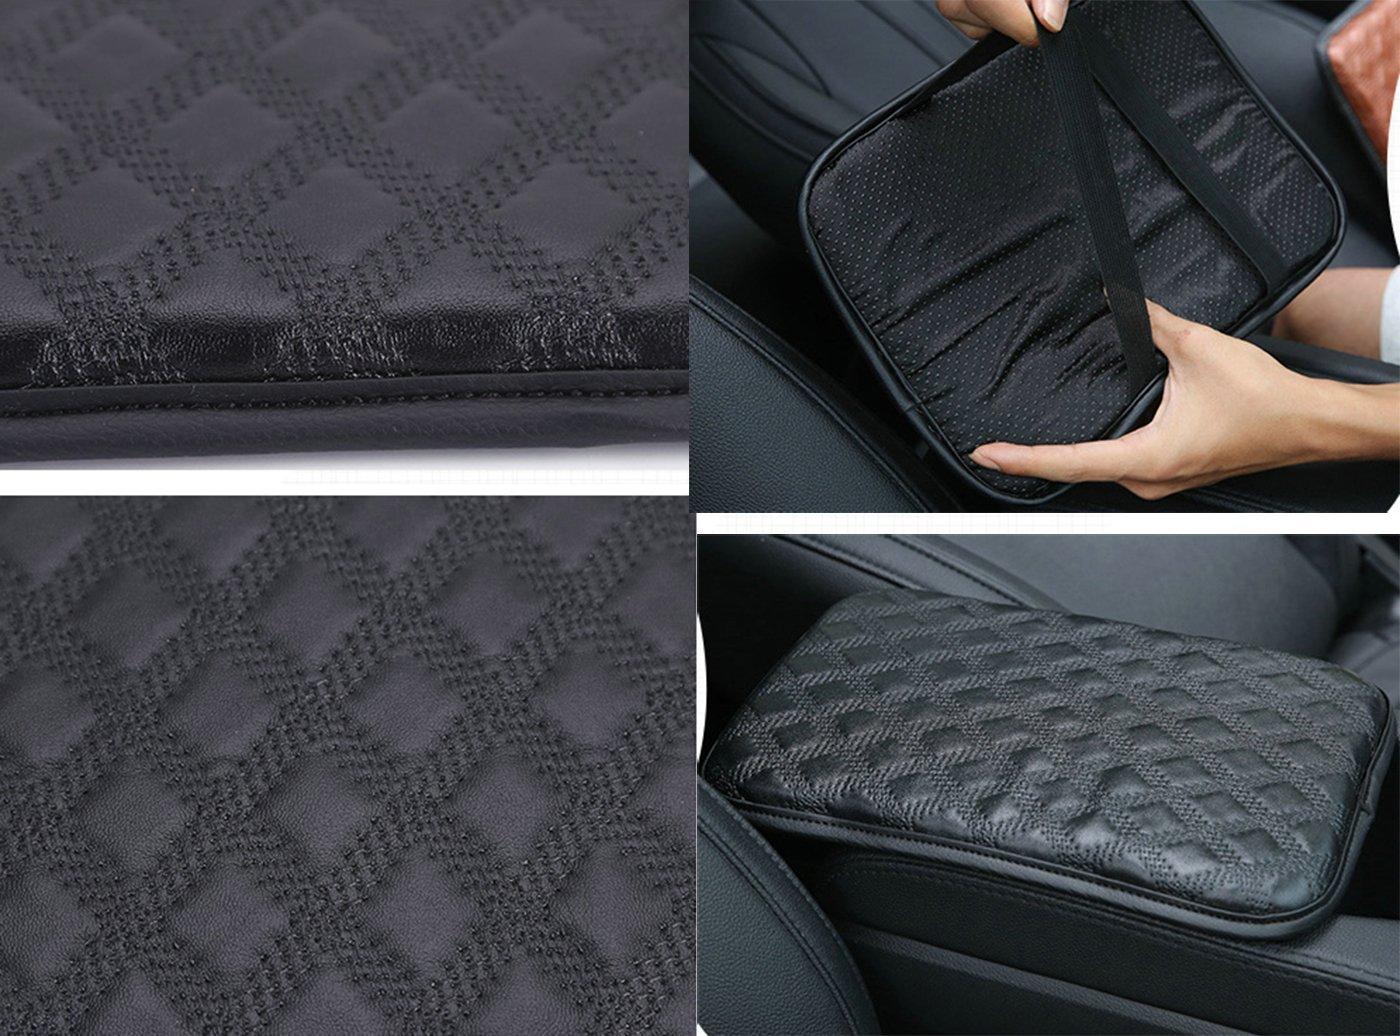 Wall Stickz Car Armrest Cushion Soft Leather Auto Center Console Pad Cover Handrail Box Universal Ergonomic Design Decoration Cushion fit sline